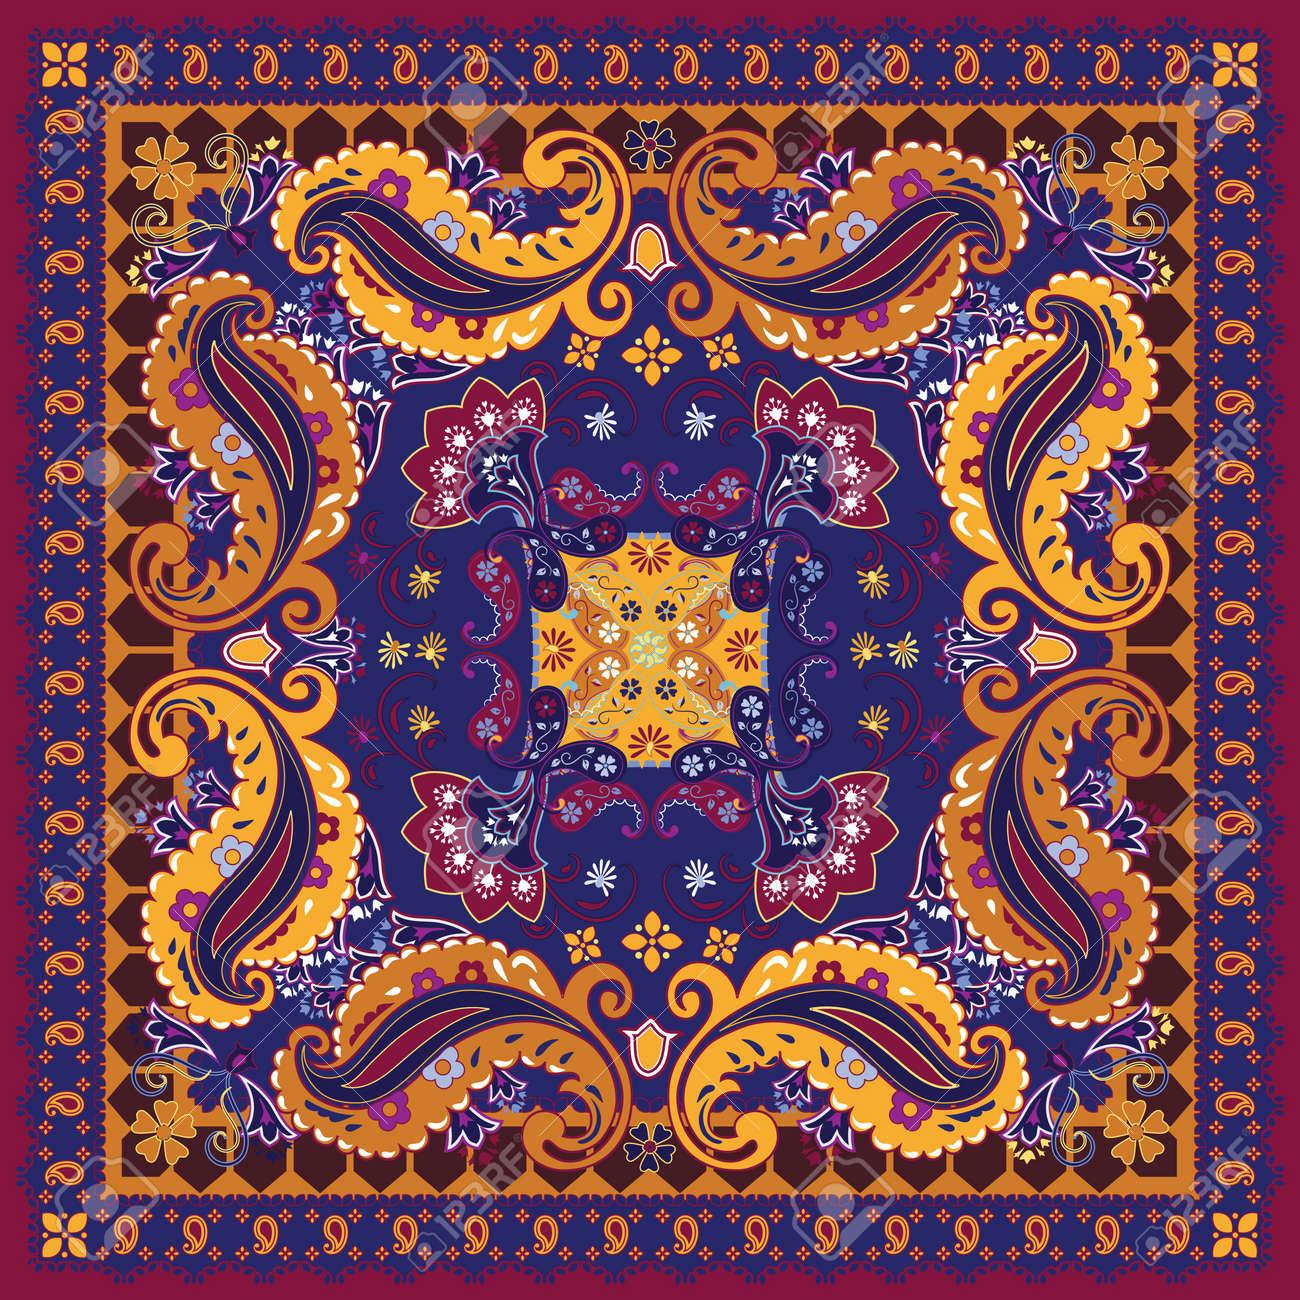 Colorful Bandana Design Stock Vector - 10193306